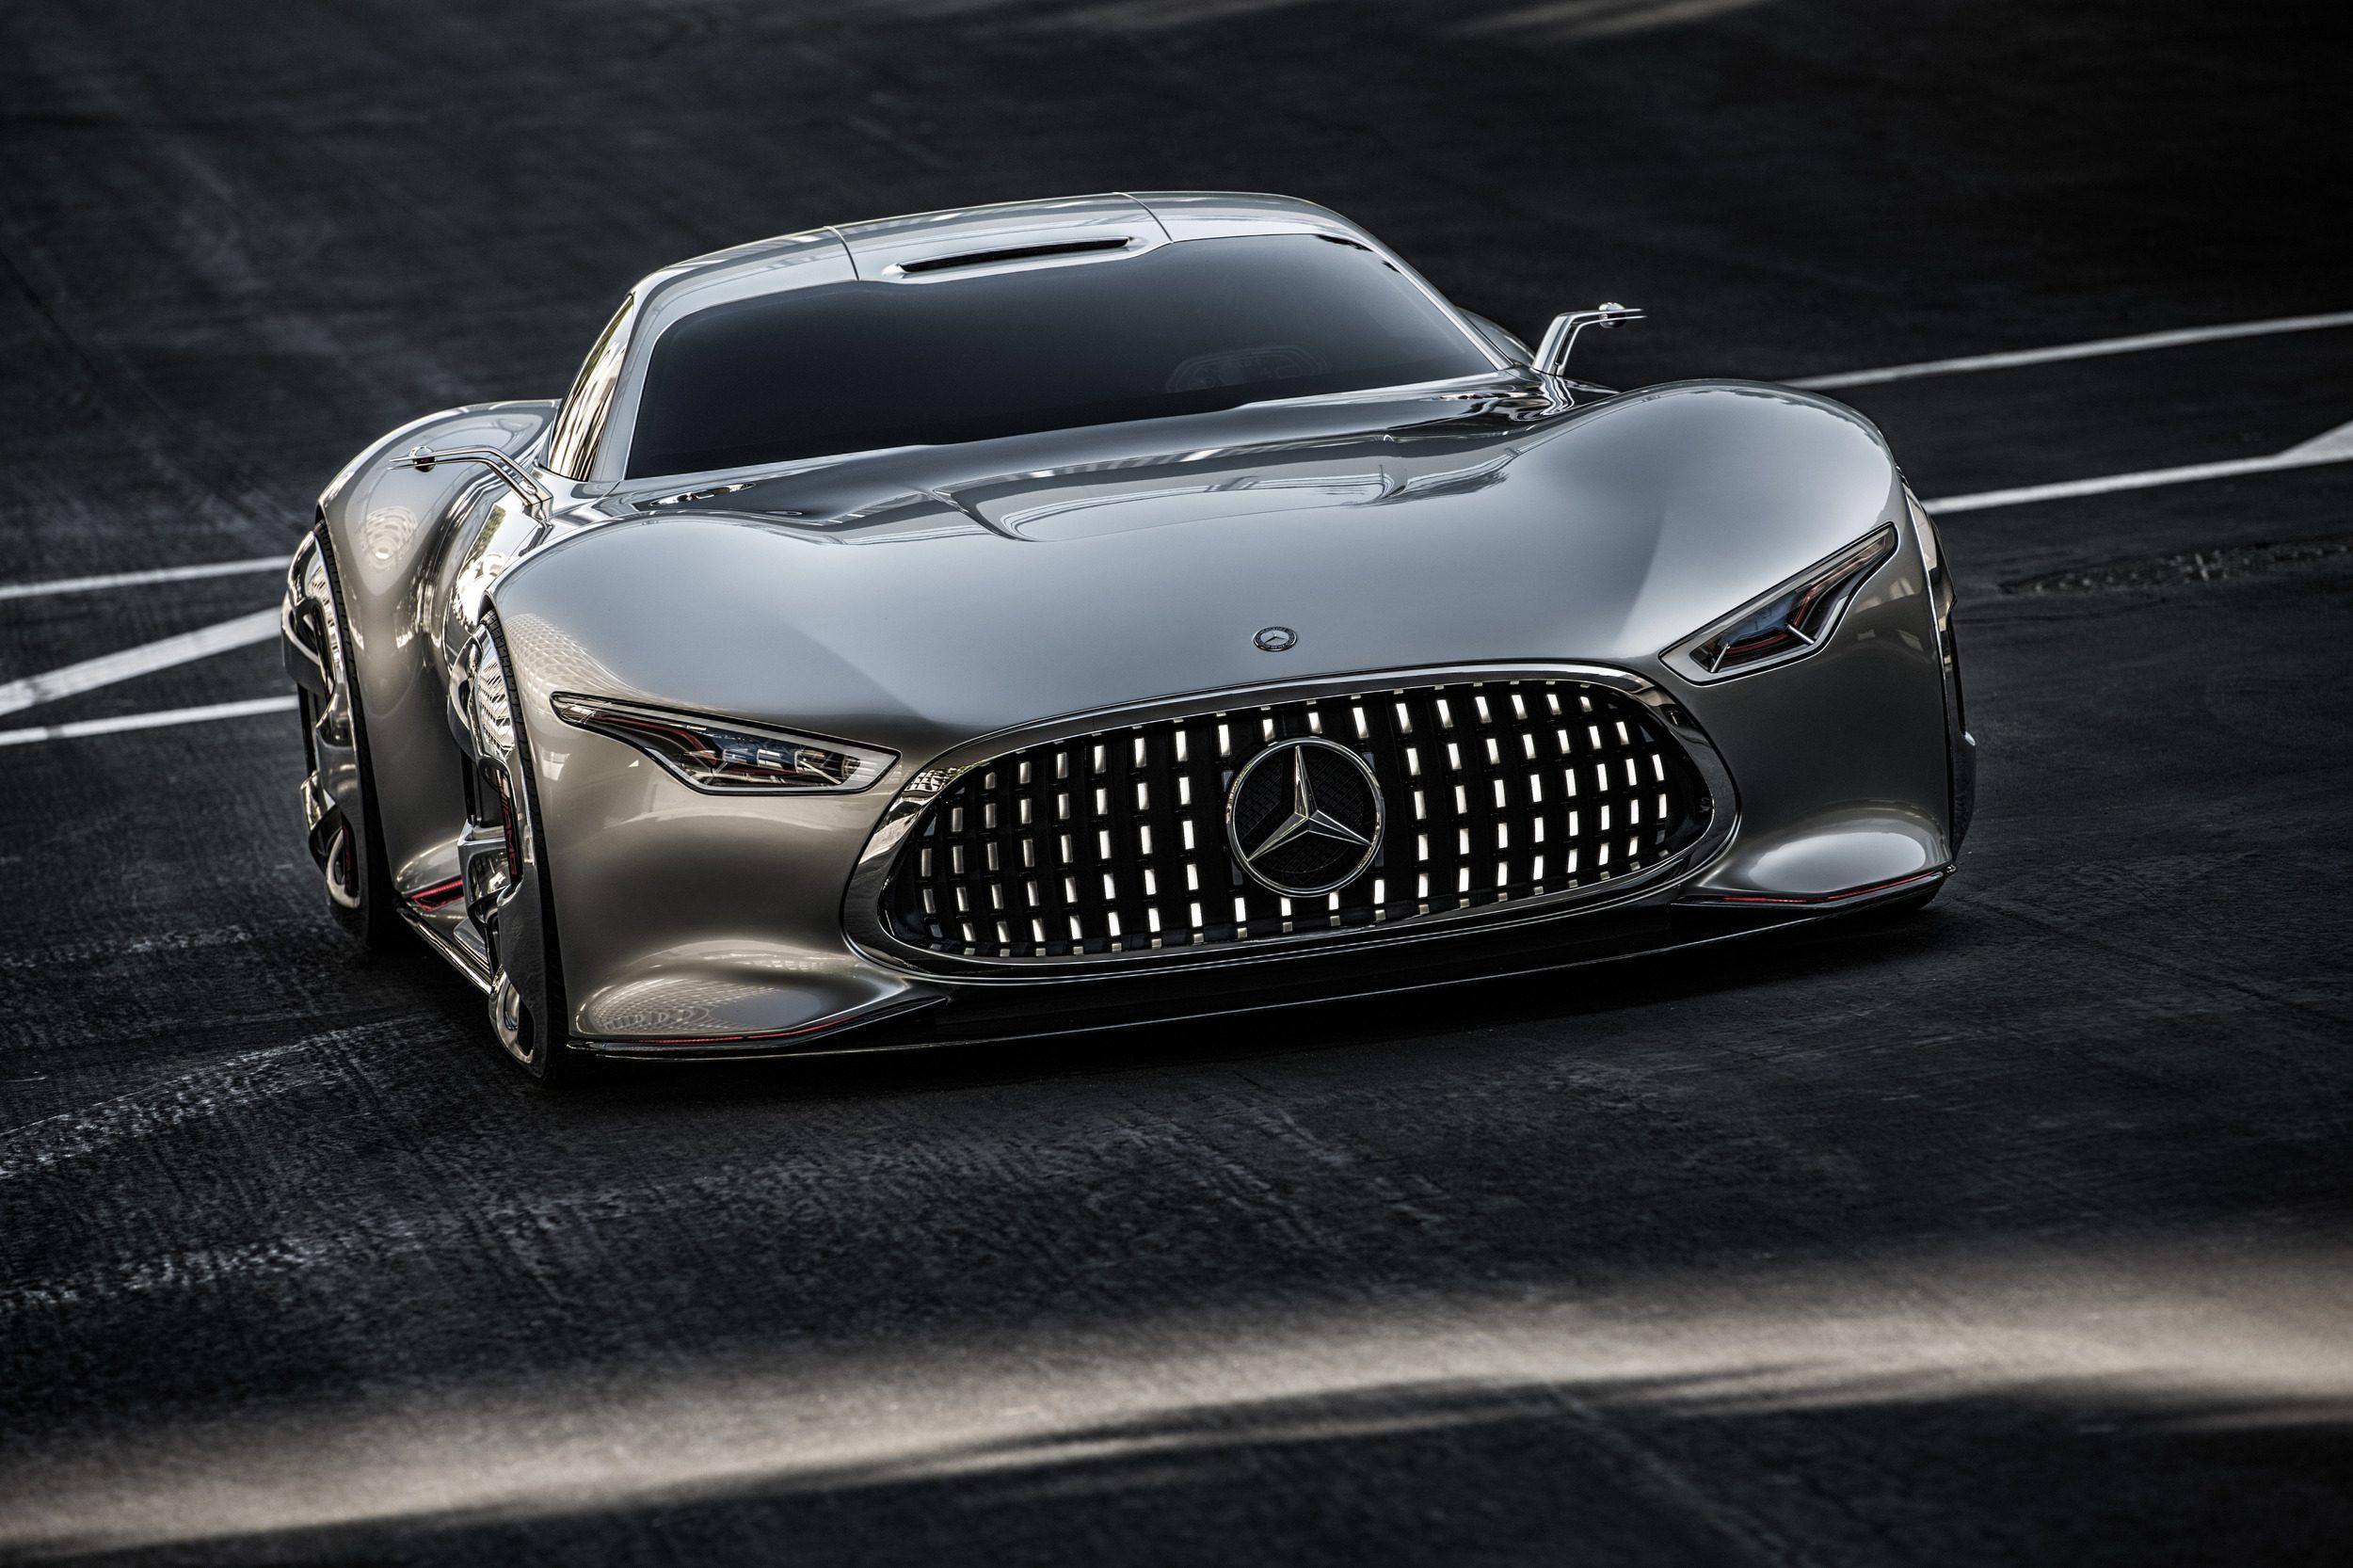 Mercedes-benz-amg-vision-gran-turismo-6-003-1.jpg